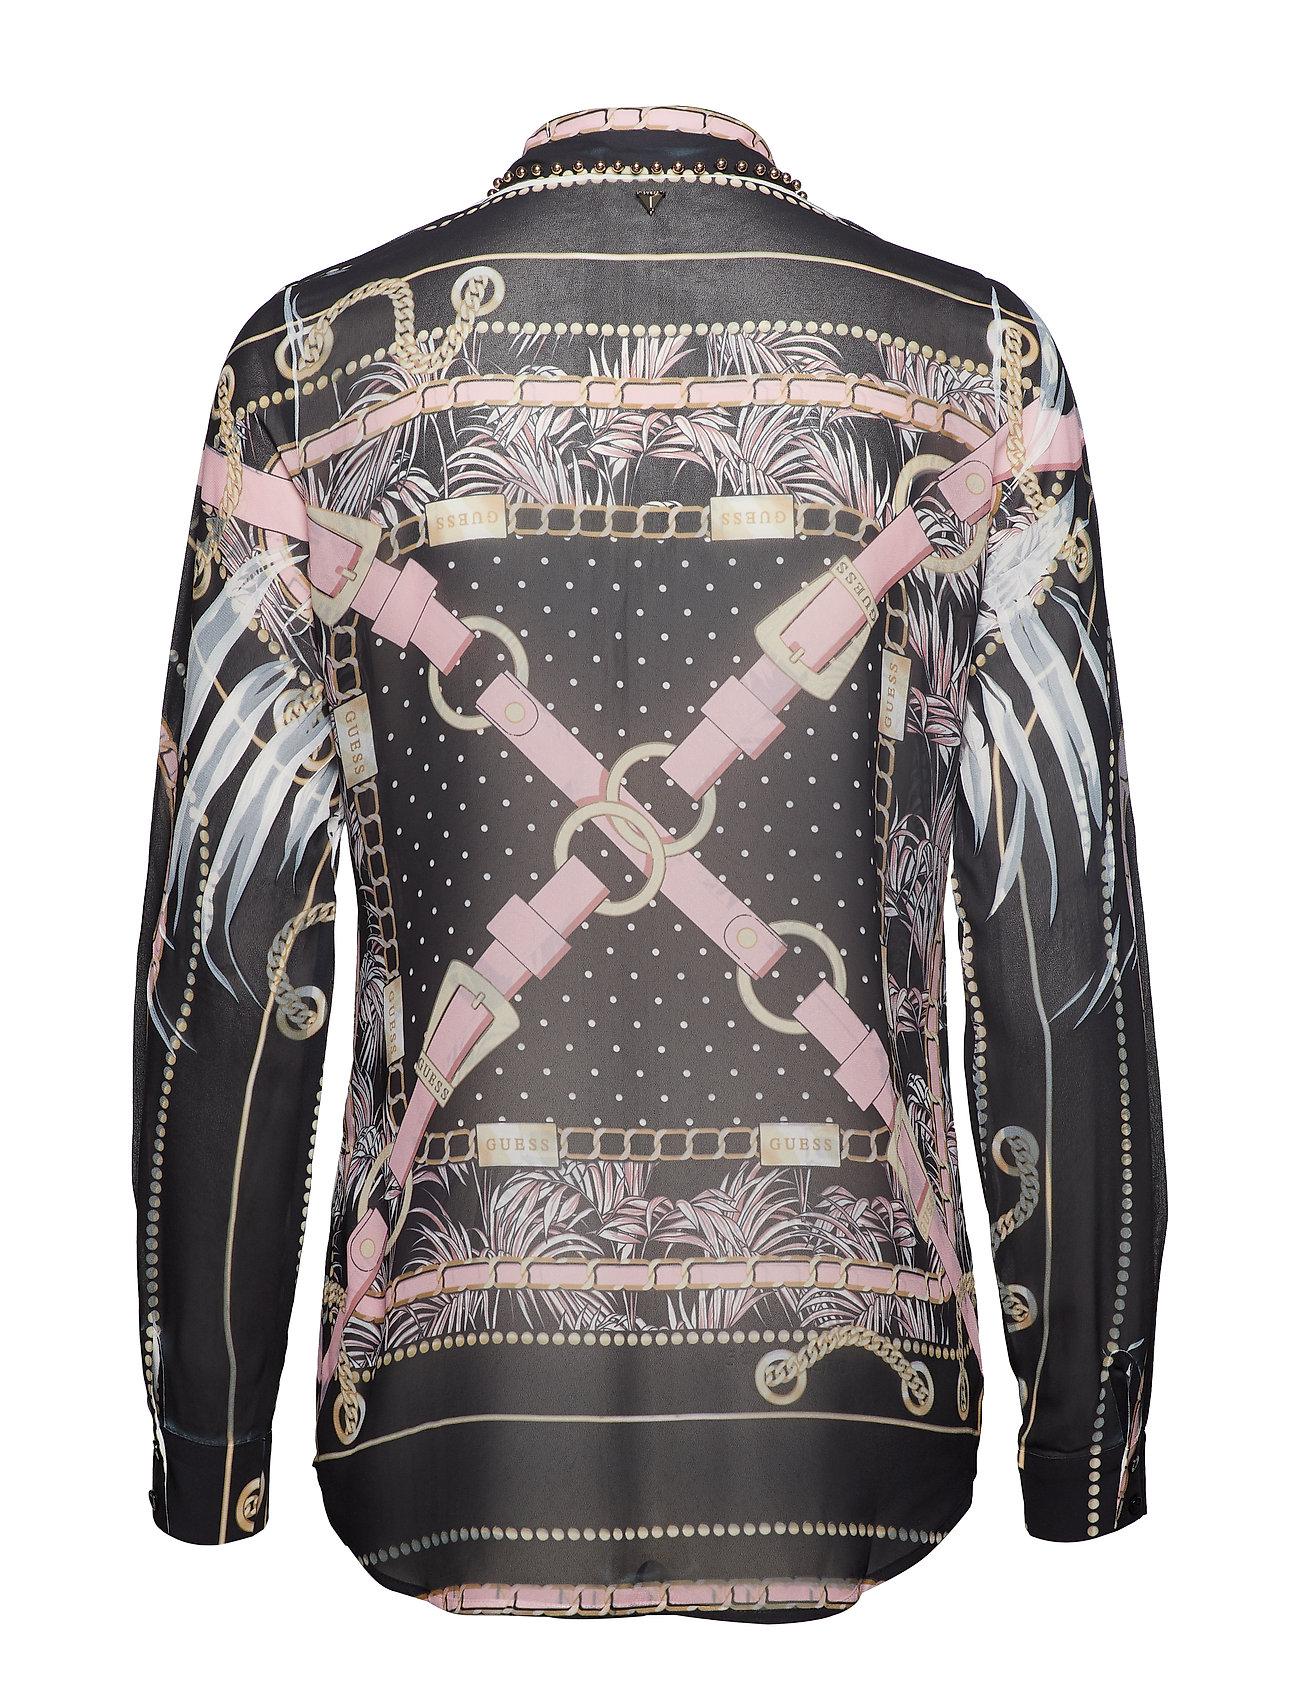 Ls Jeans Belt Shirtpastel BlackGuess Clouis UzqSVMp